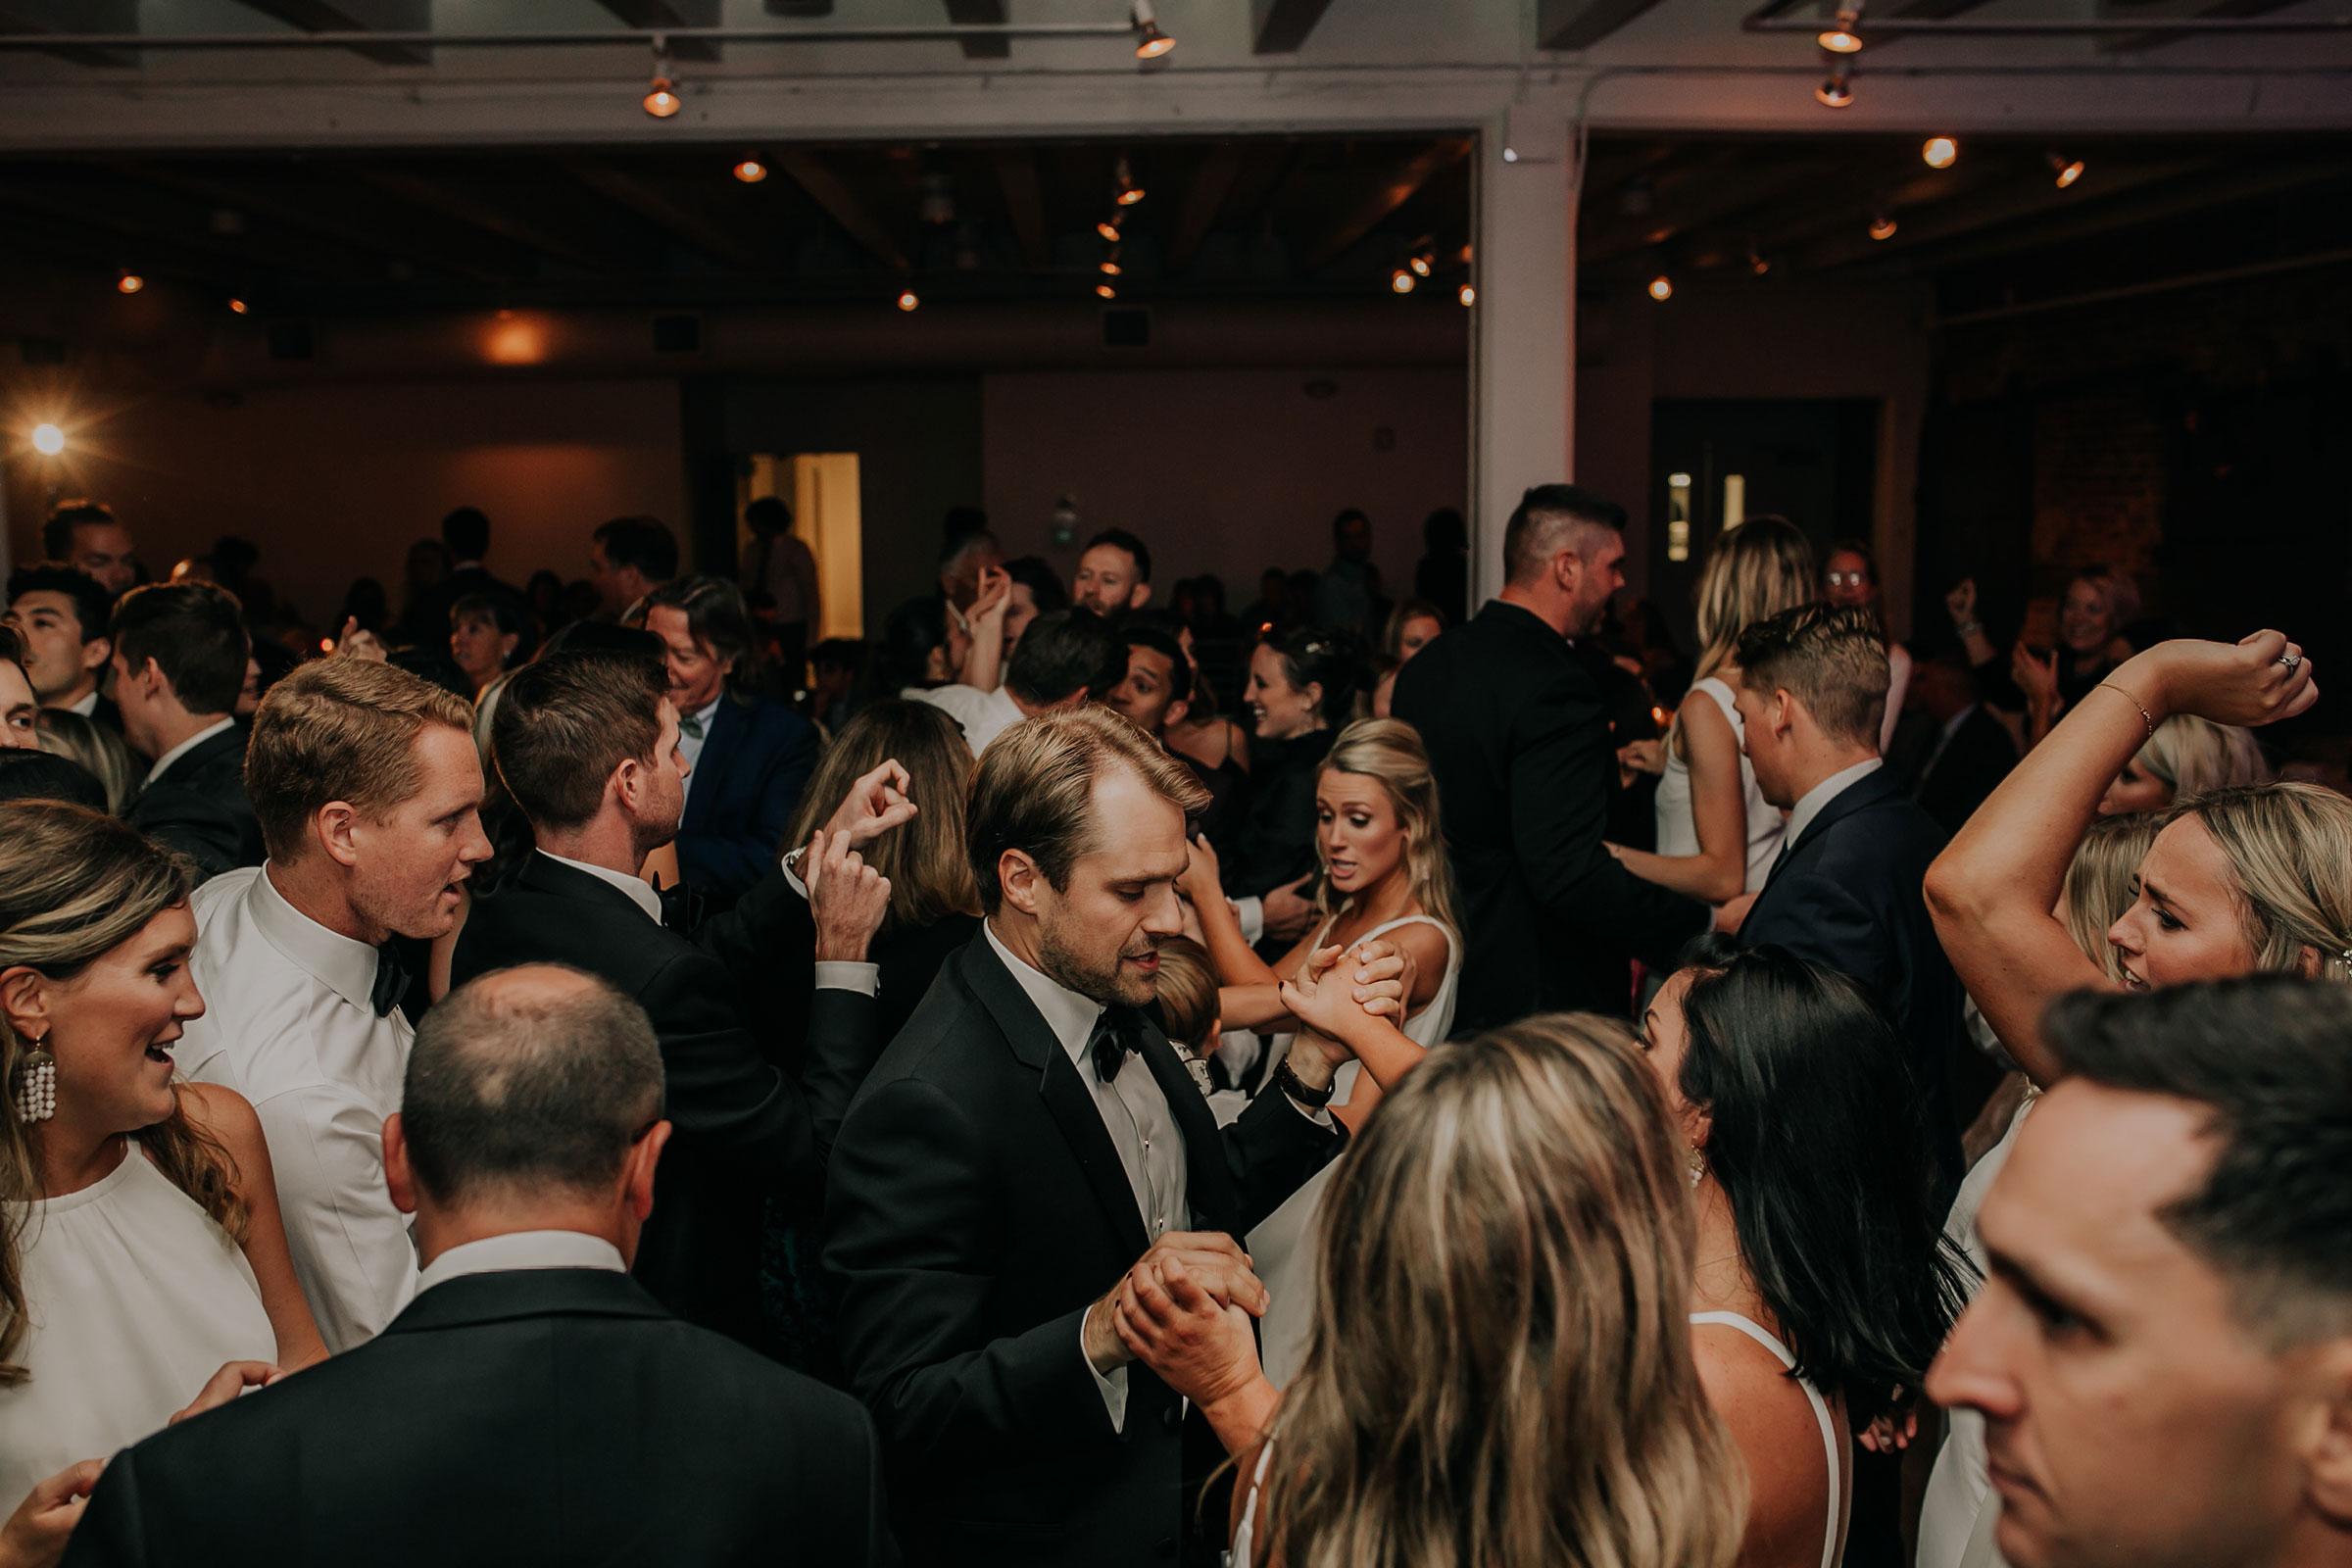 founders-one-nine-reception-dancing-omaha-nebraska-raelyn-ramey-photography.jpg